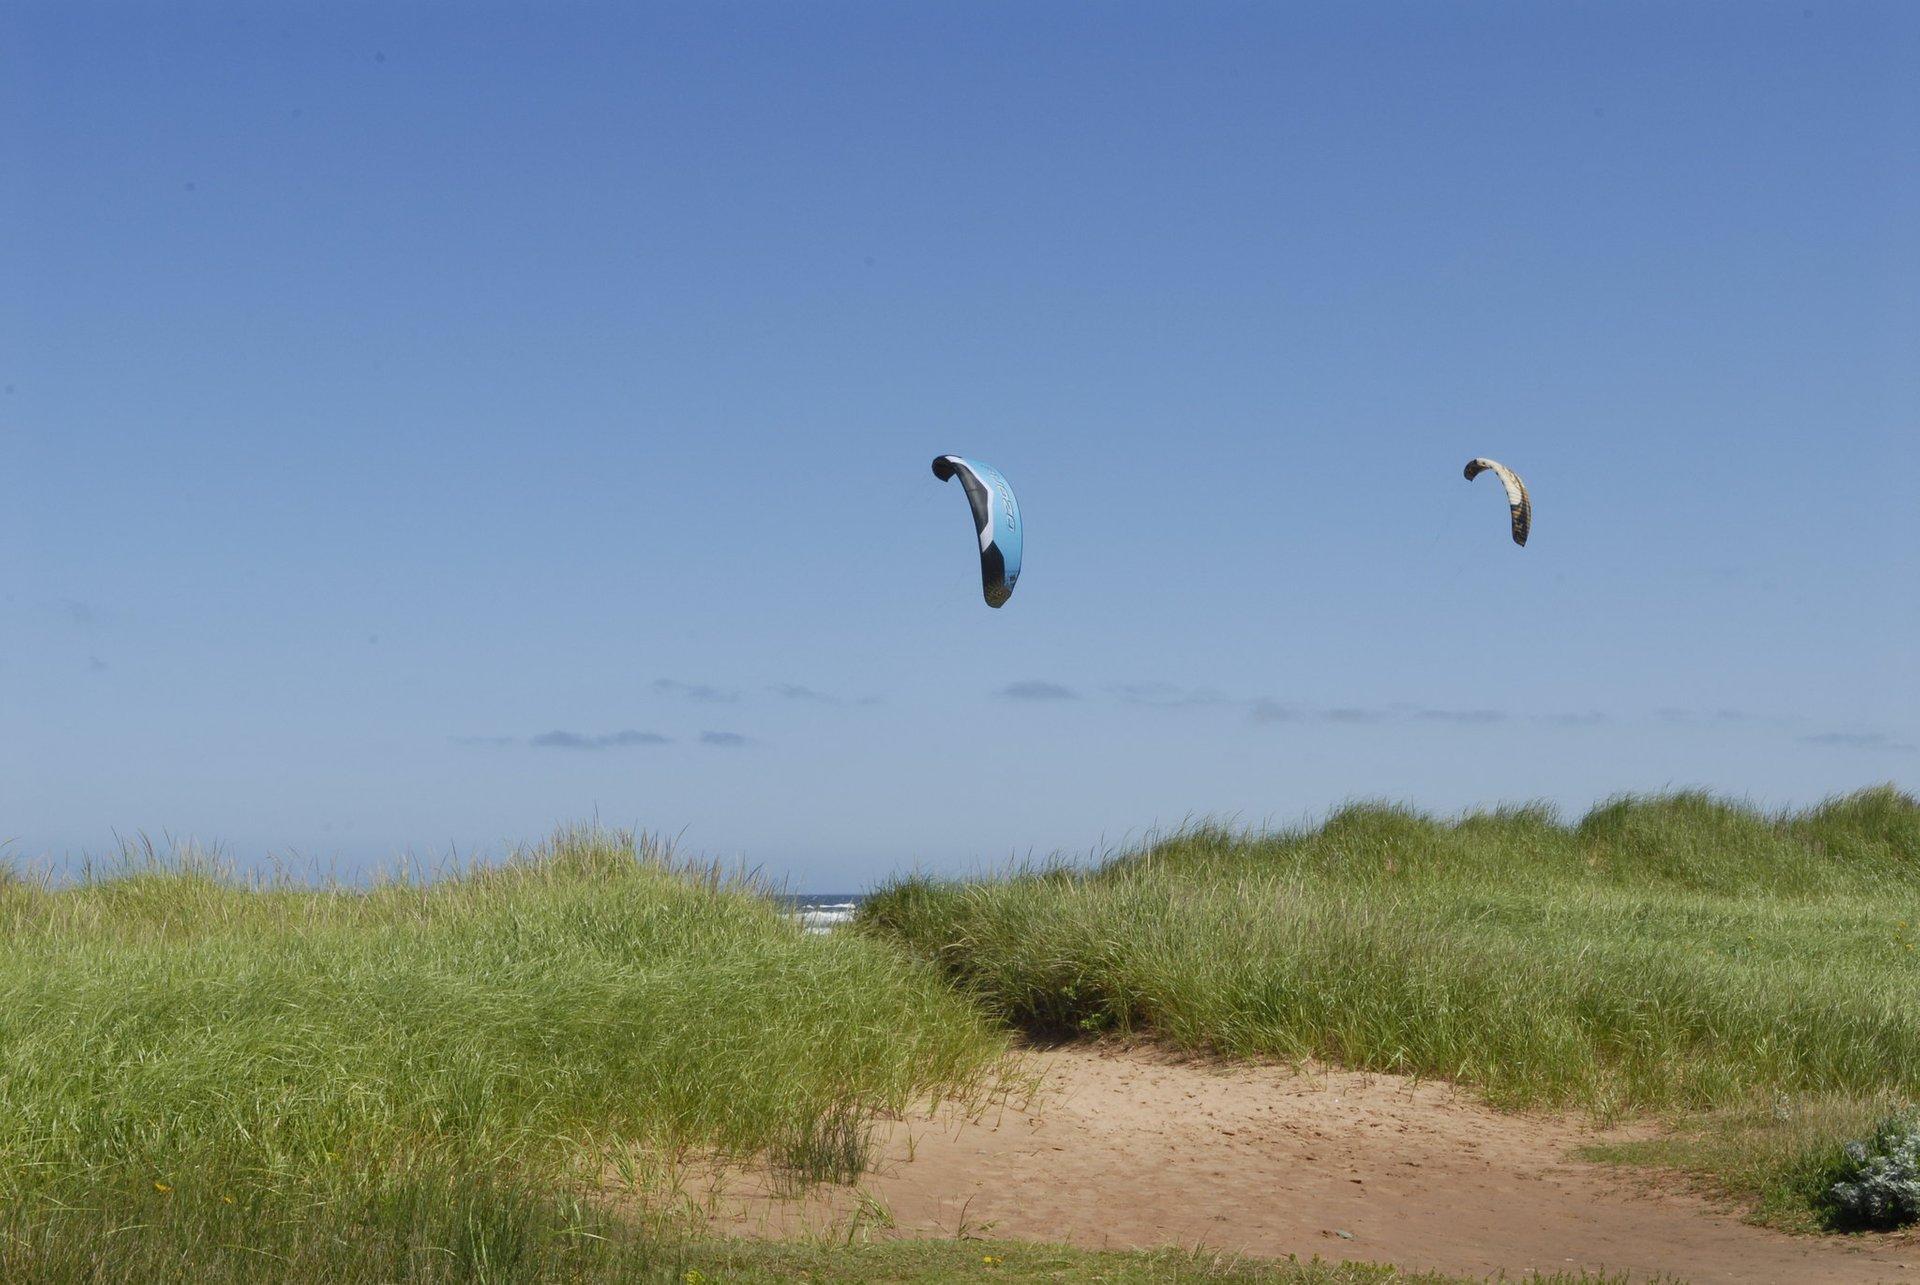 Kitesurfing & Windsurfing on Magdalen Islands in Quebec - Best Season 2020